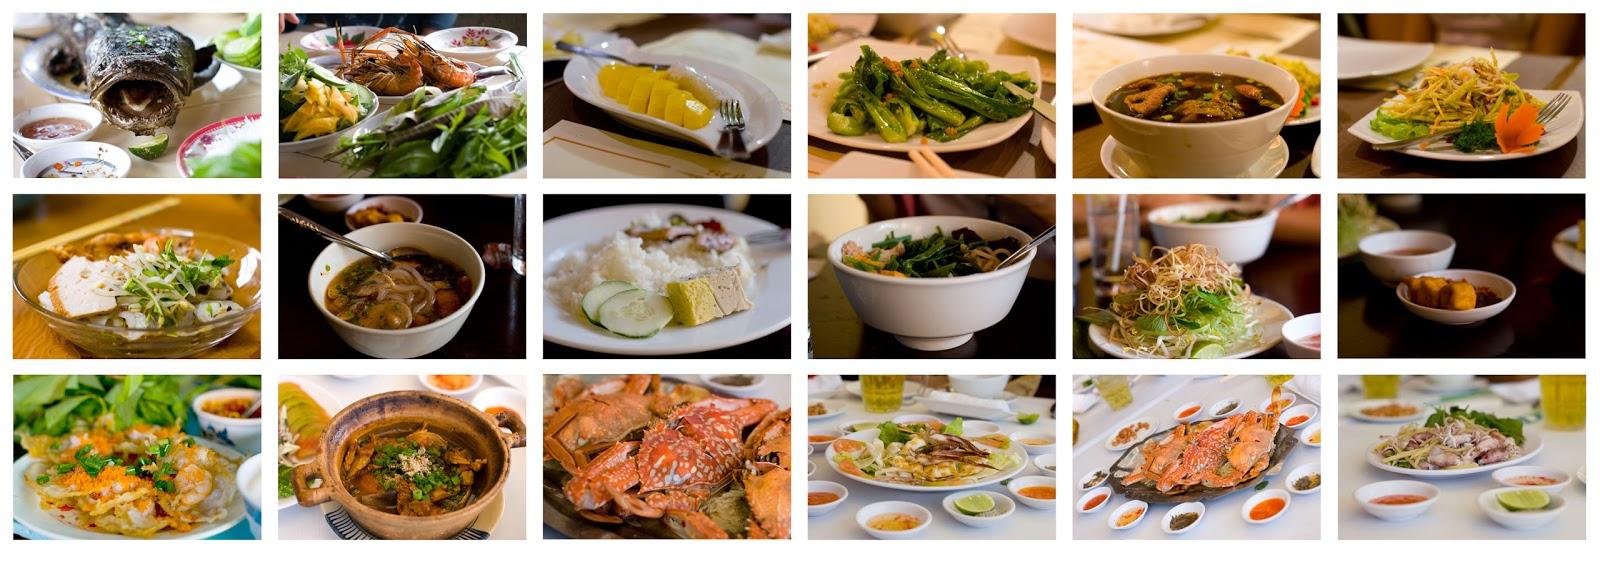 Vietnamese Food List